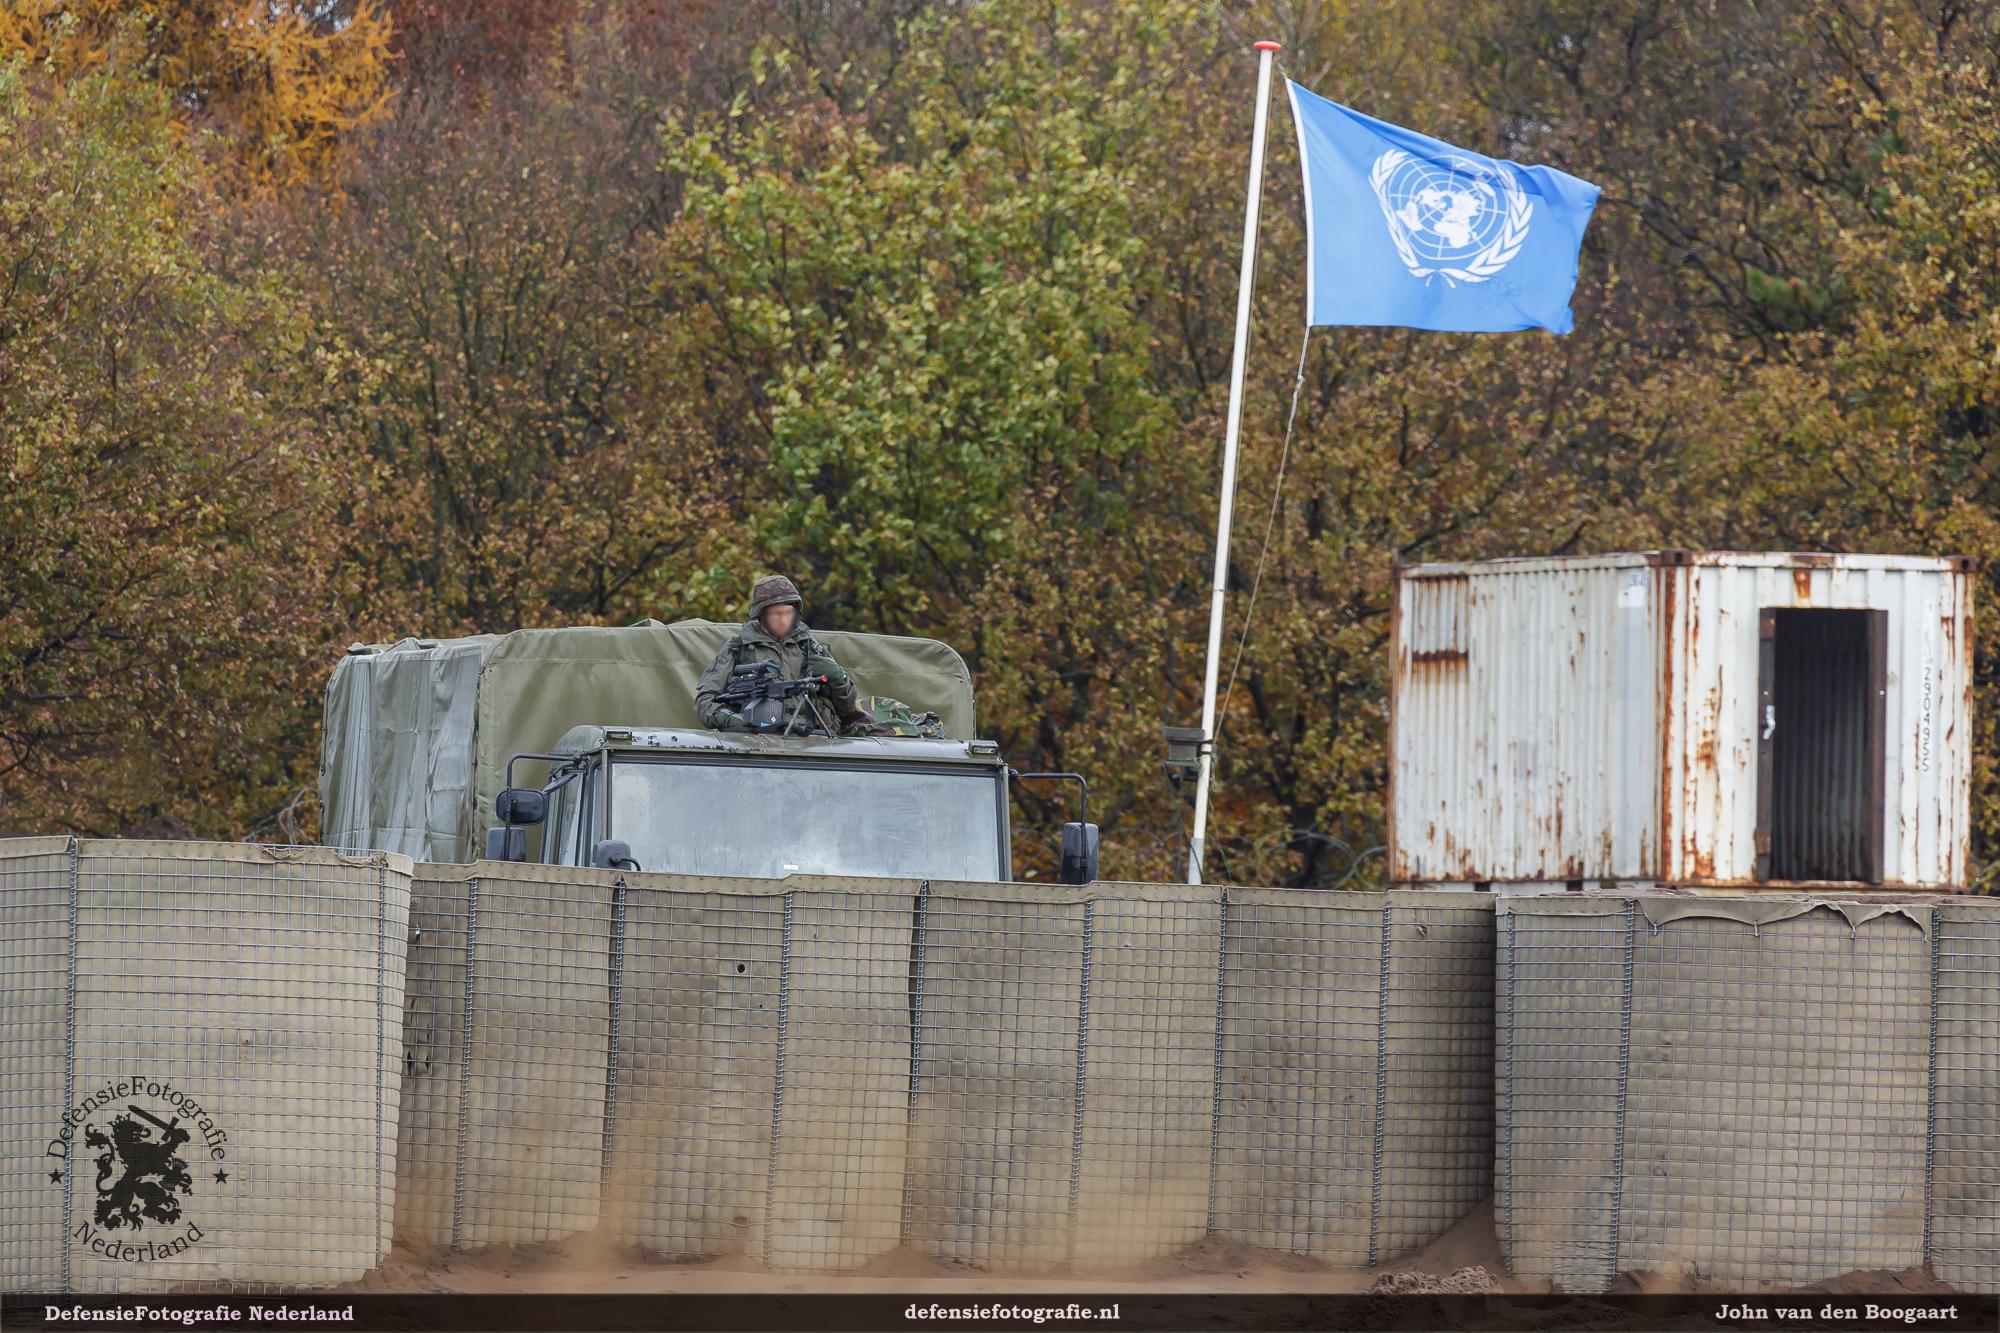 Vlag wappert op de commpound wat nu dienst doet als UN camp